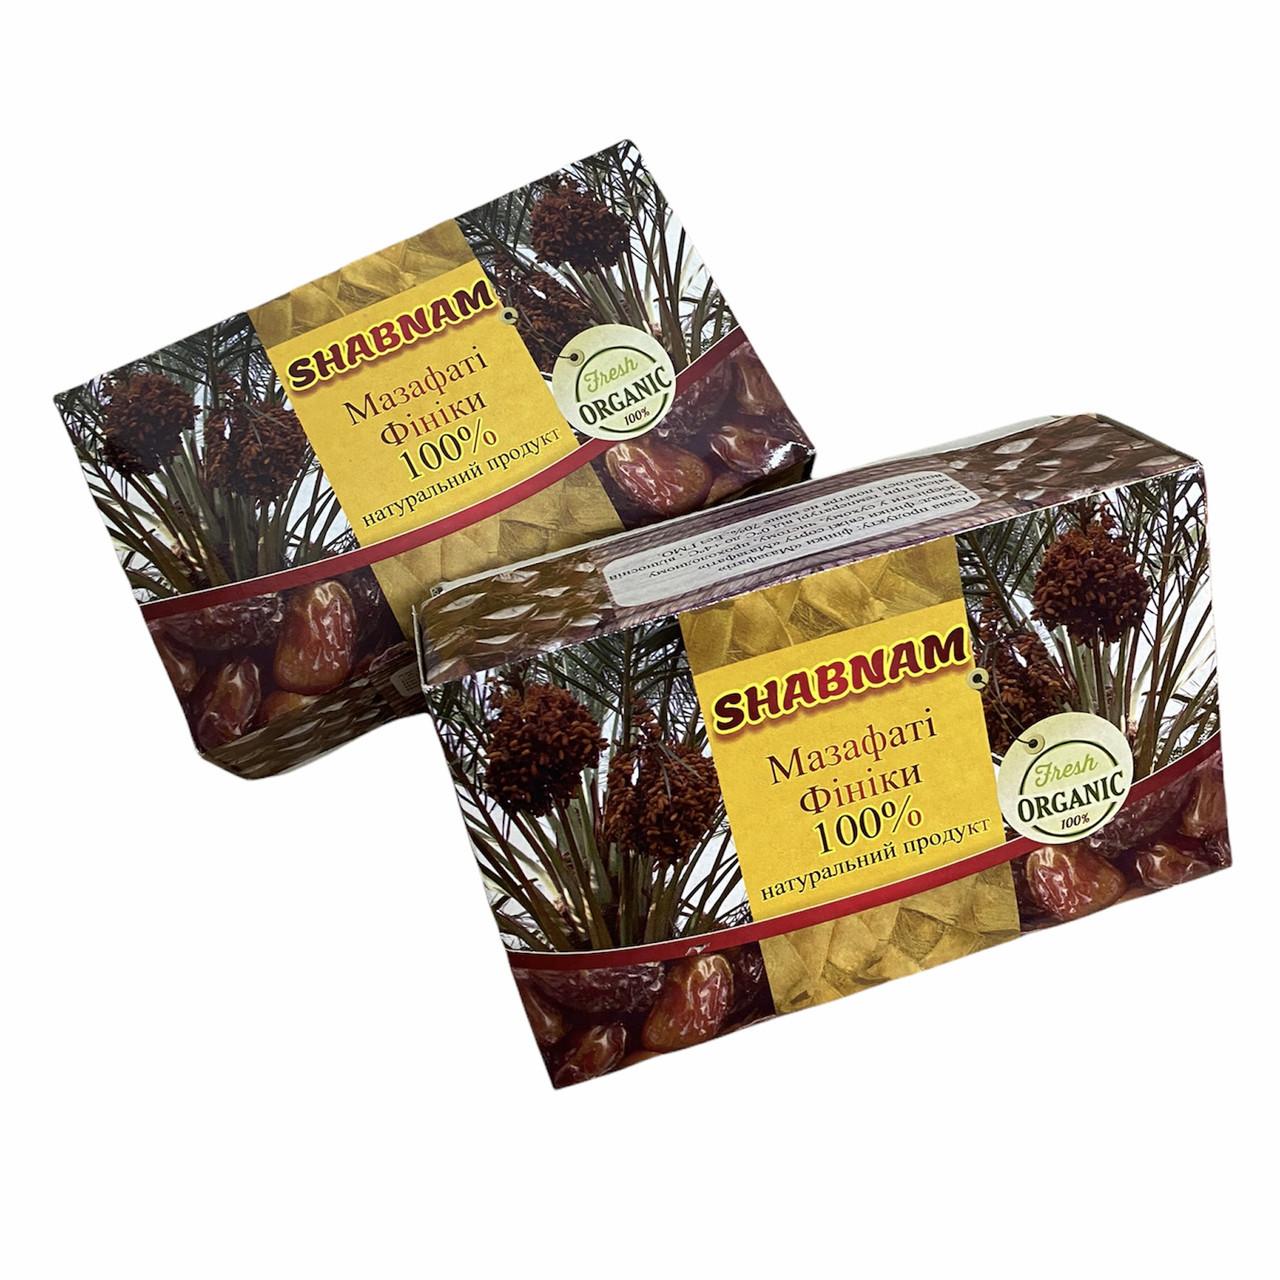 Финики Mazafati shabnam 600г, финики в коробке натуральные мазафати  без сахара, Иран